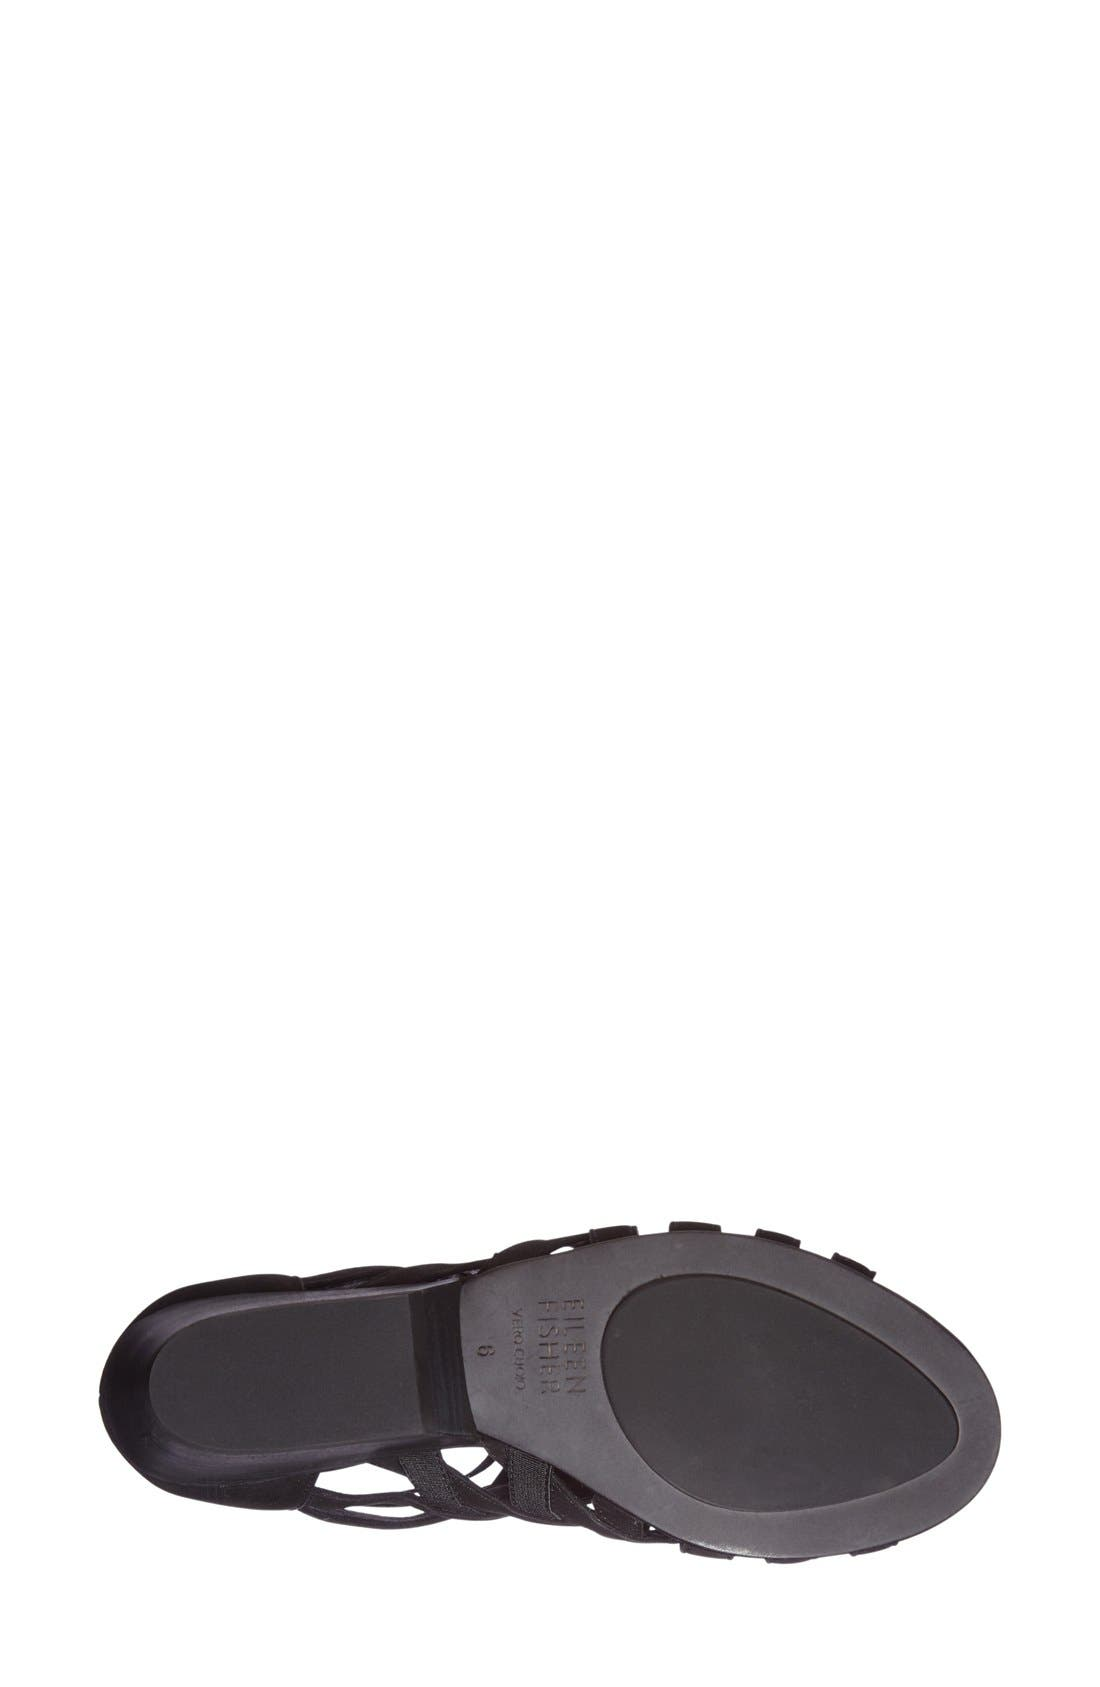 Oodle Sandal,                             Alternate thumbnail 4, color,                             Black